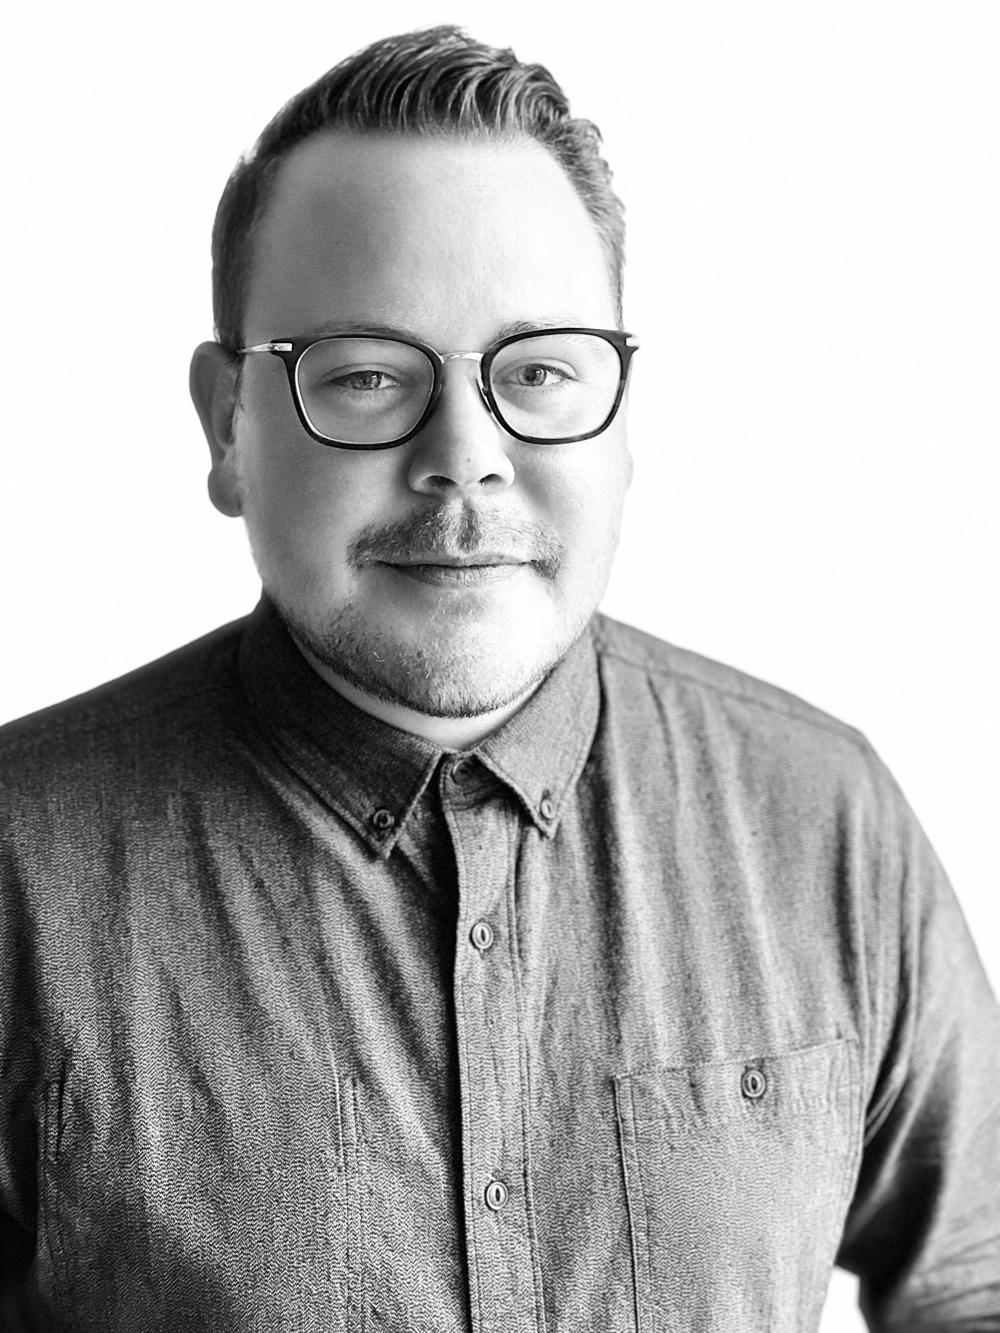 Kramer Hoehn, Head of Production (Vancouver)